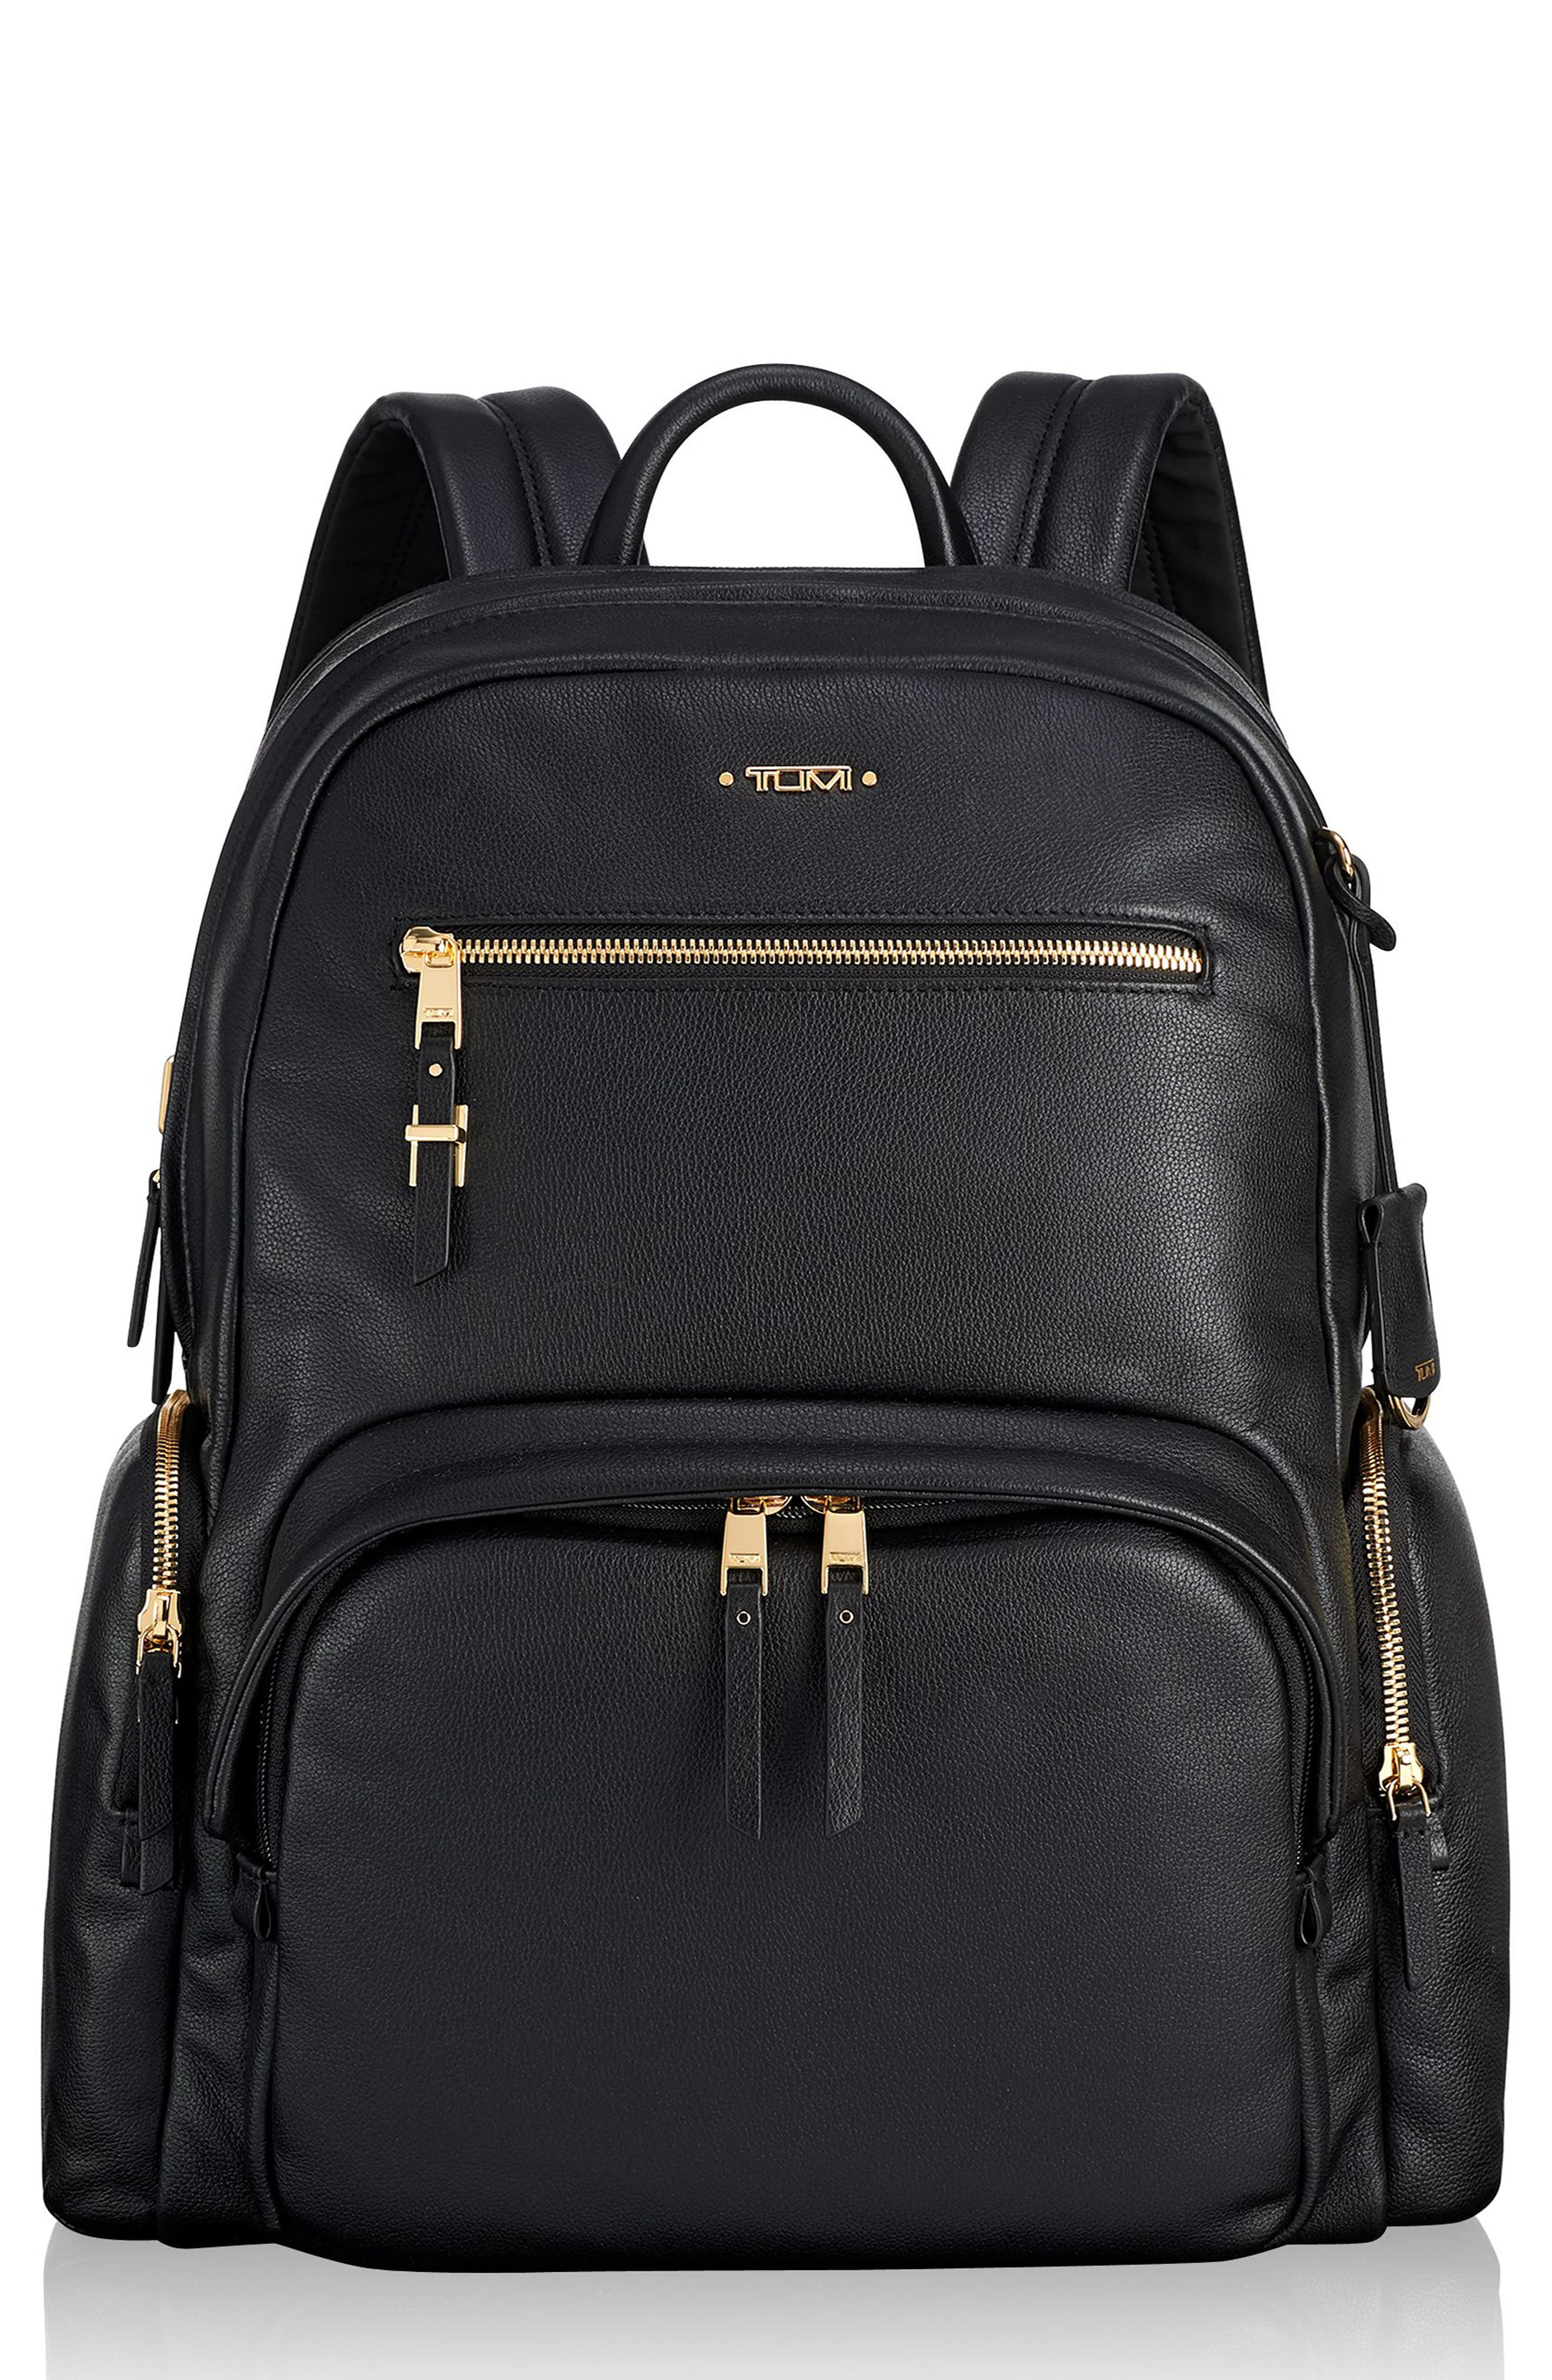 TUMI, Voyageur Carson Leather Backpack, Main thumbnail 1, color, BLACK